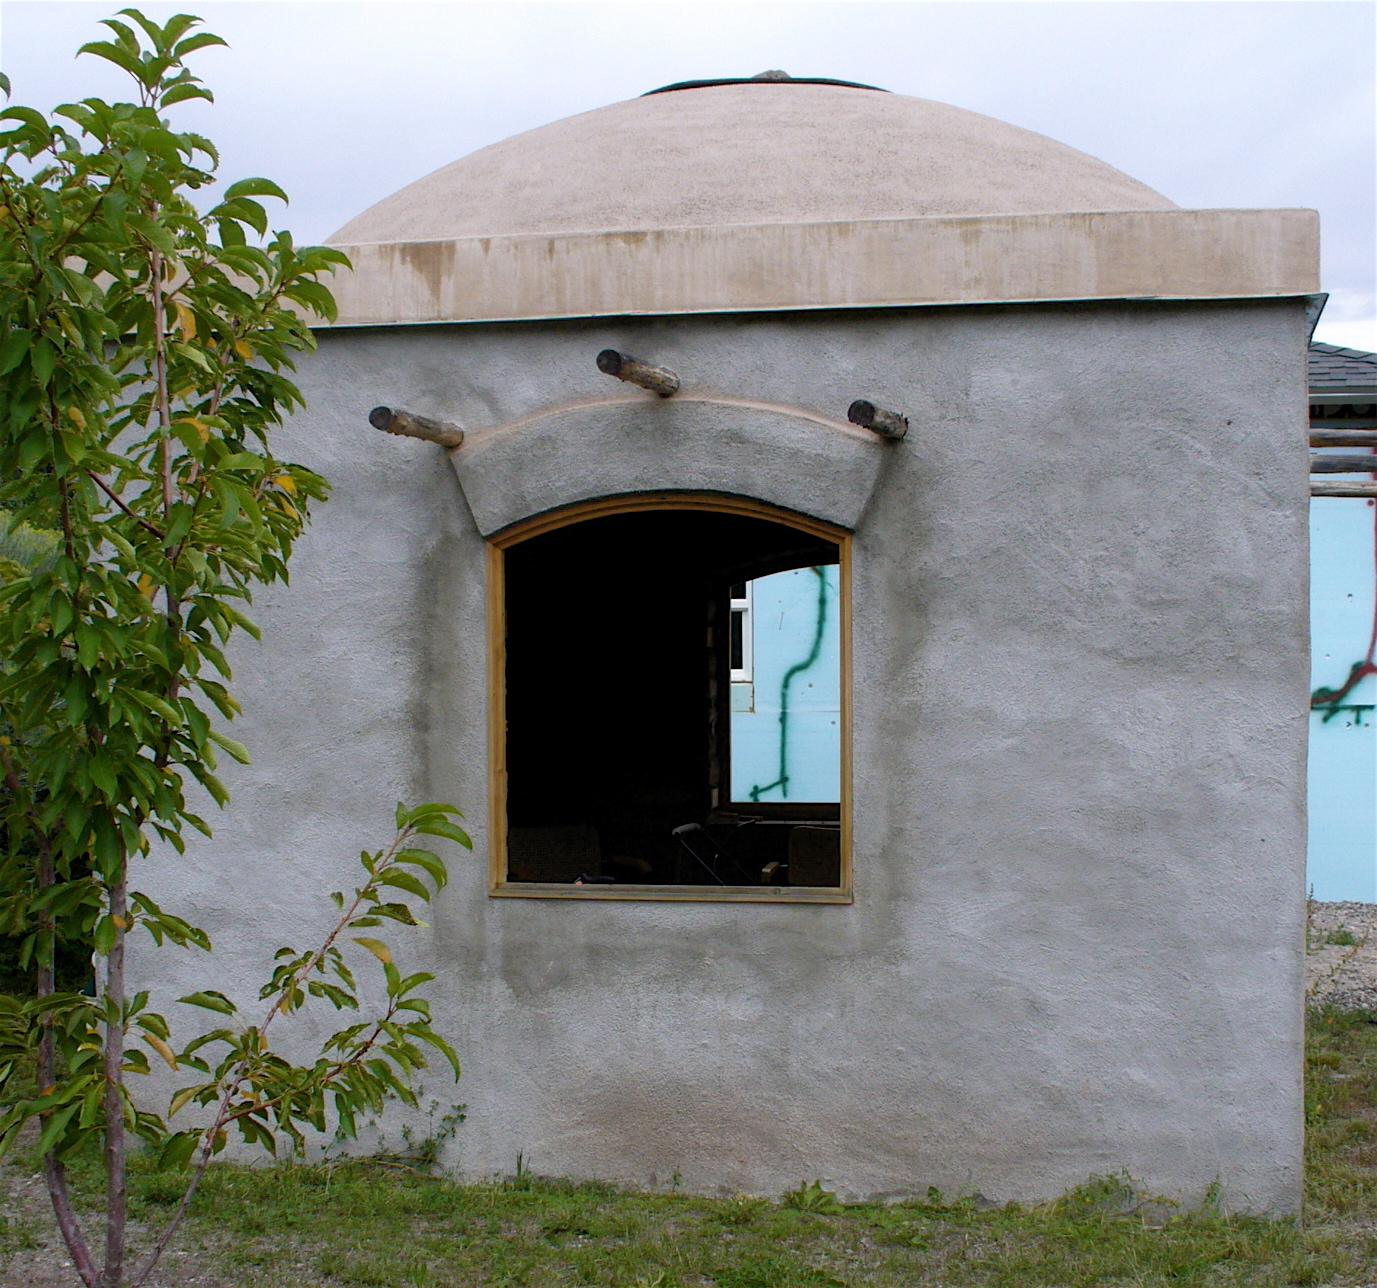 Alt build blog an adobe dome building - How to build an adobe house ...